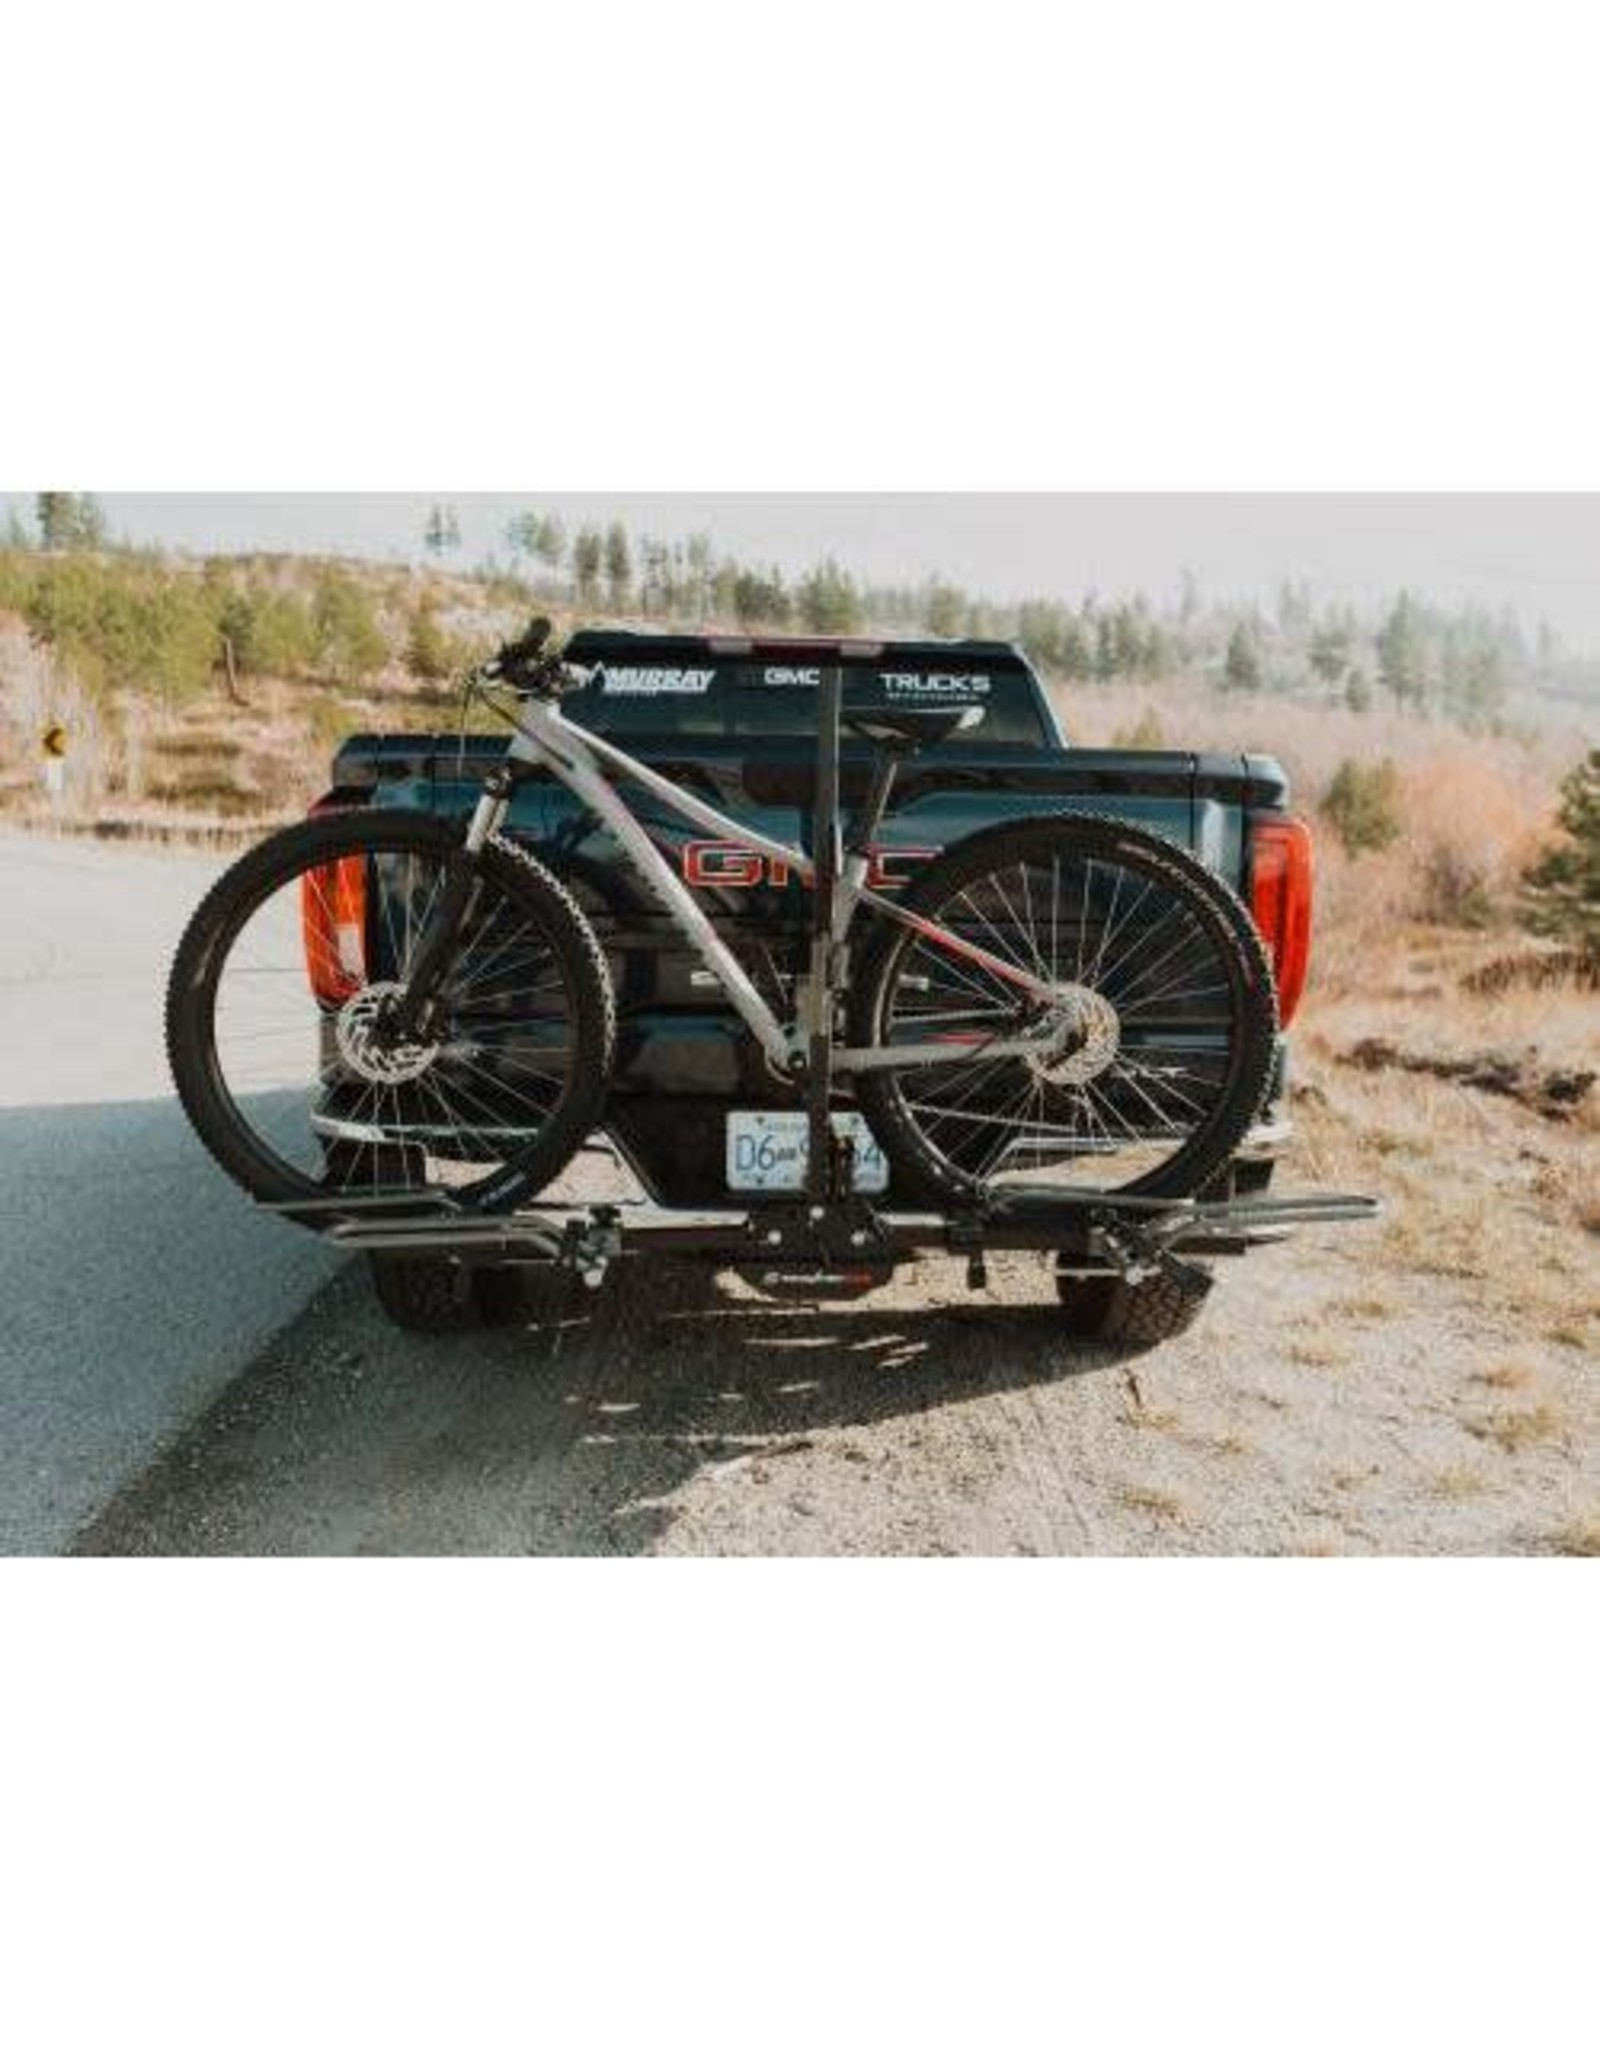 Swagman Swagman XTC 2 bike rack